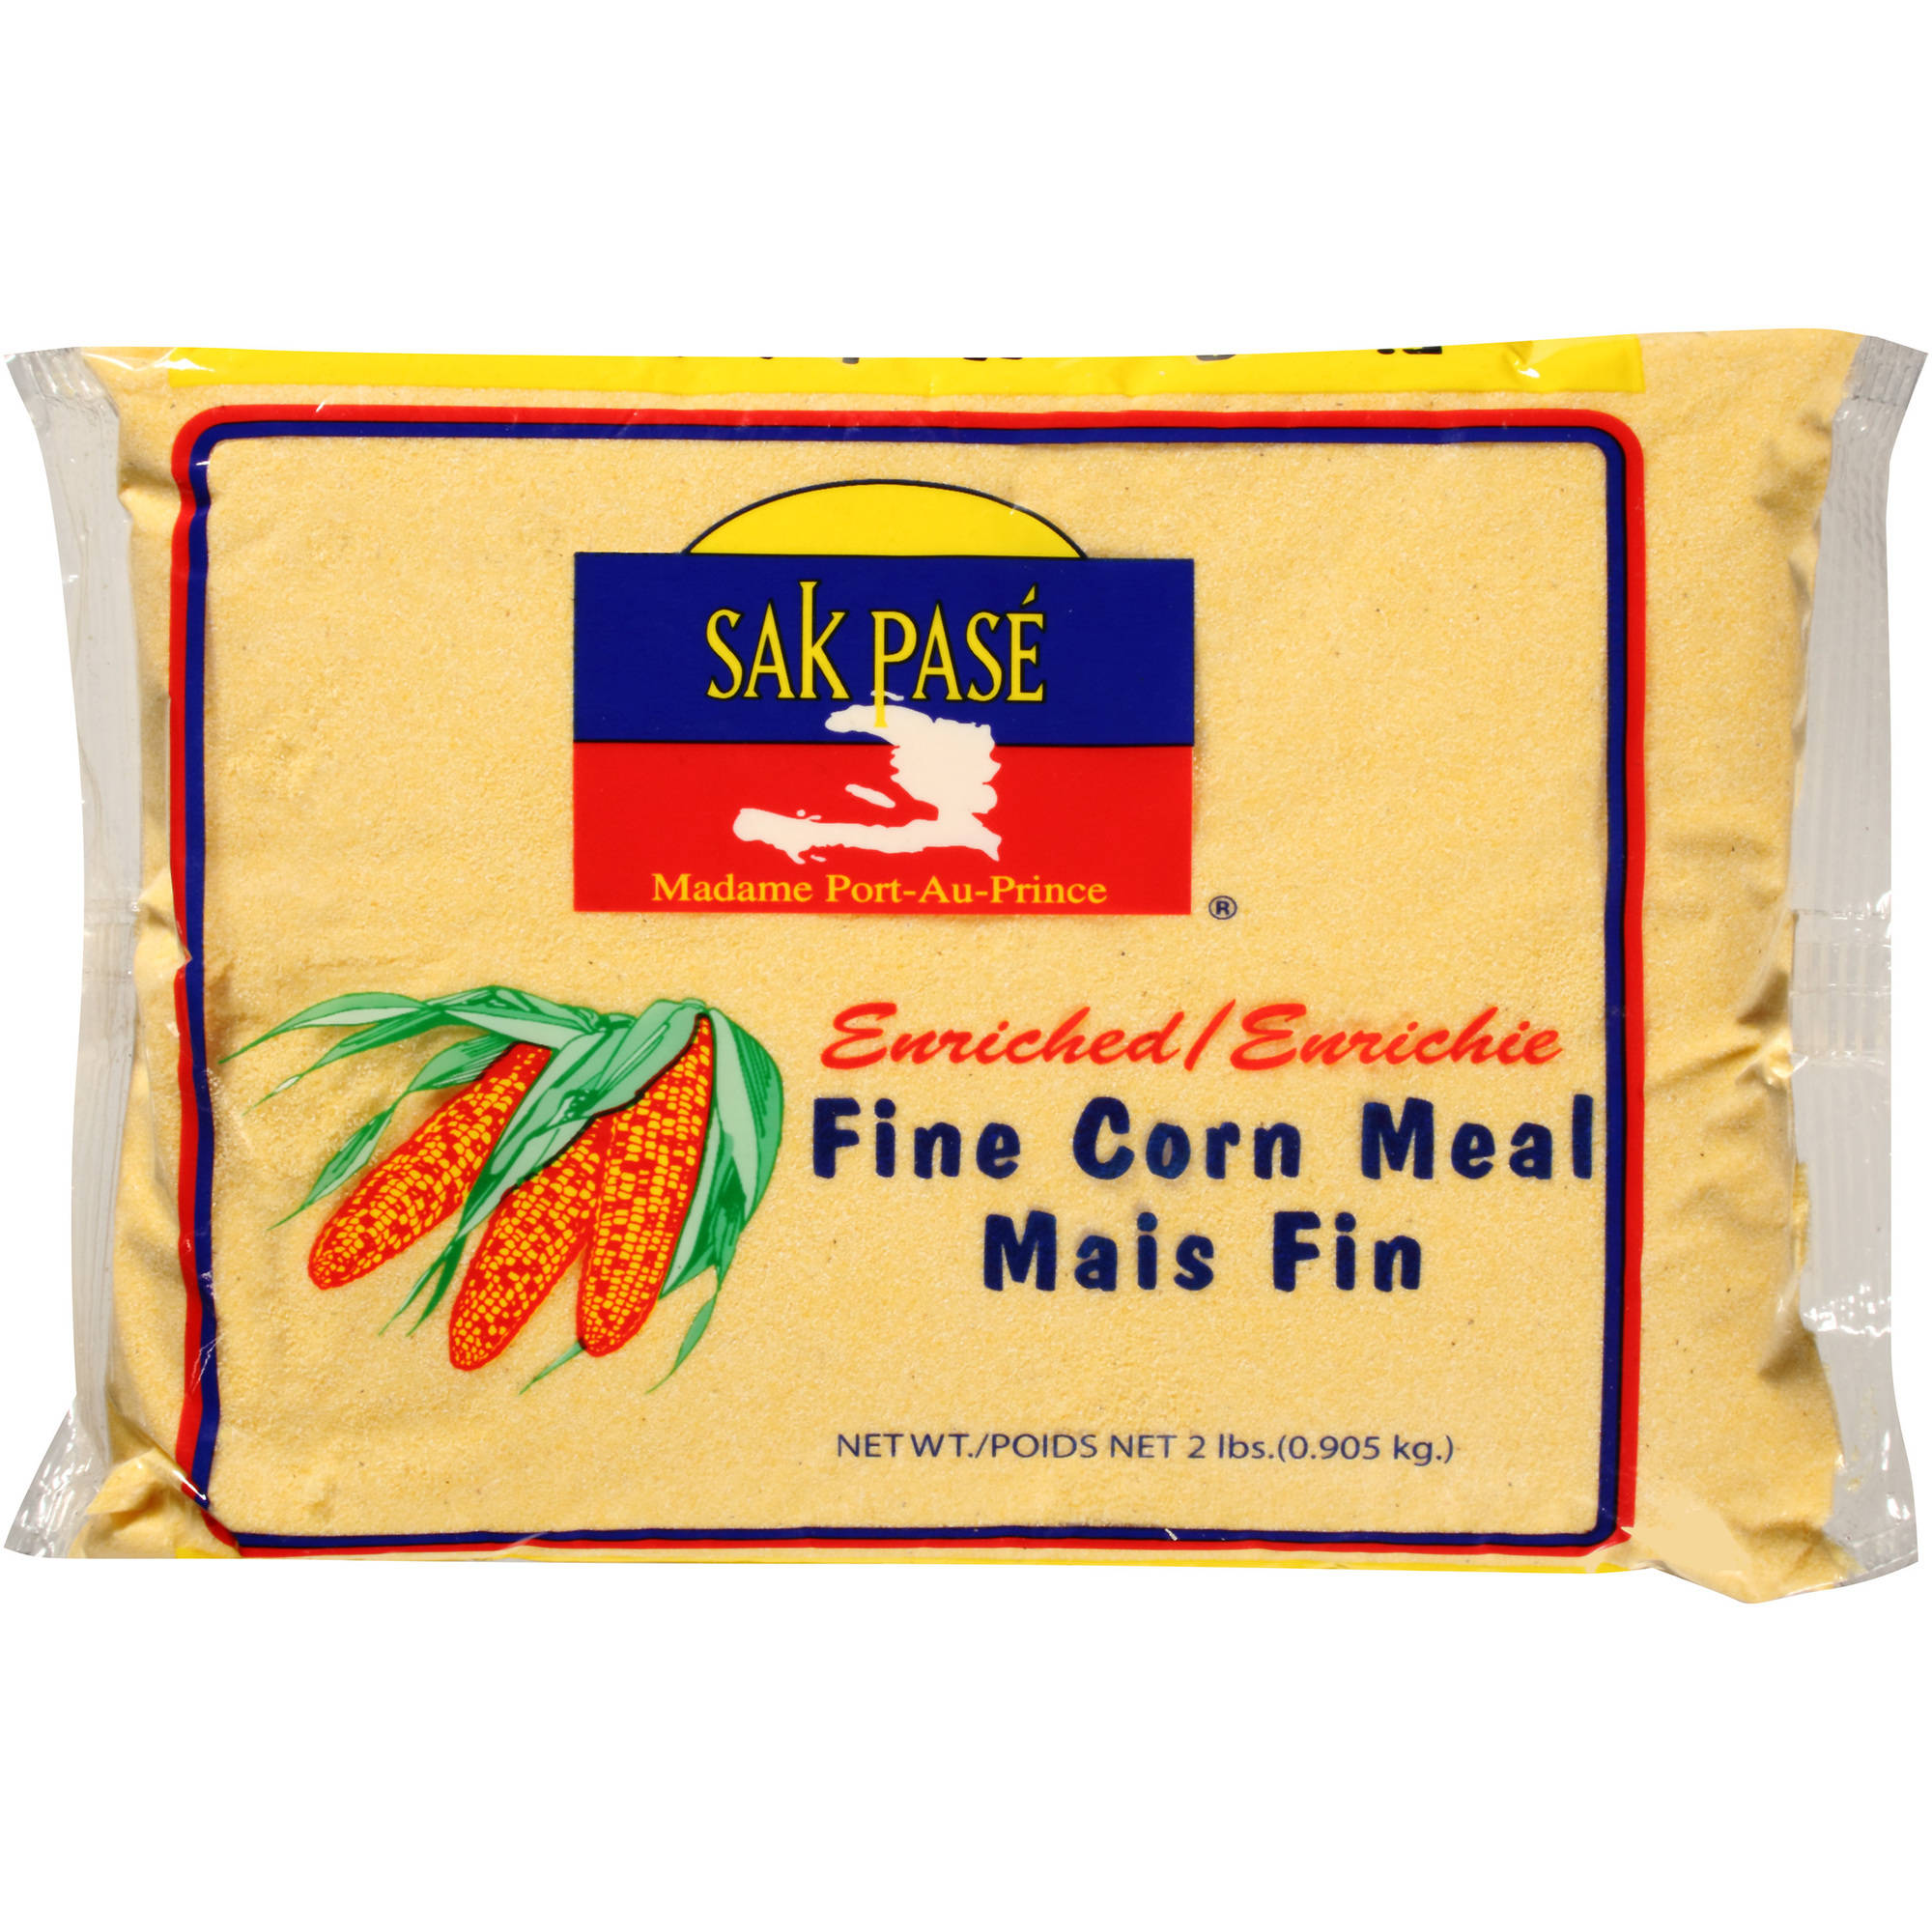 Sak Pase Madame Port-Au-Prince Fine Corn Meal, 2 lbs